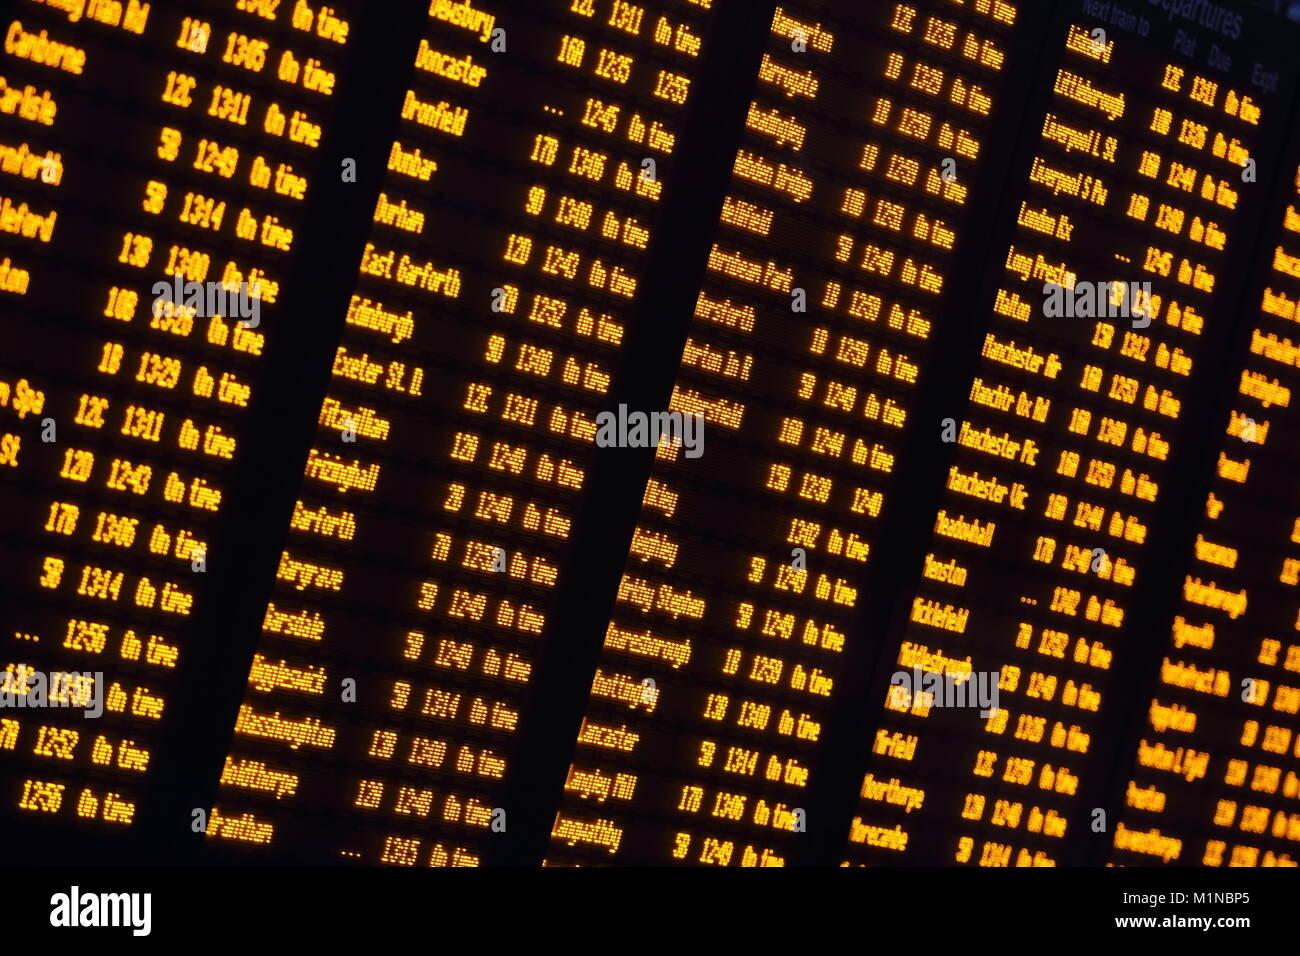 Matrix Board Stock Photos & Matrix Board Stock Images - Alamy